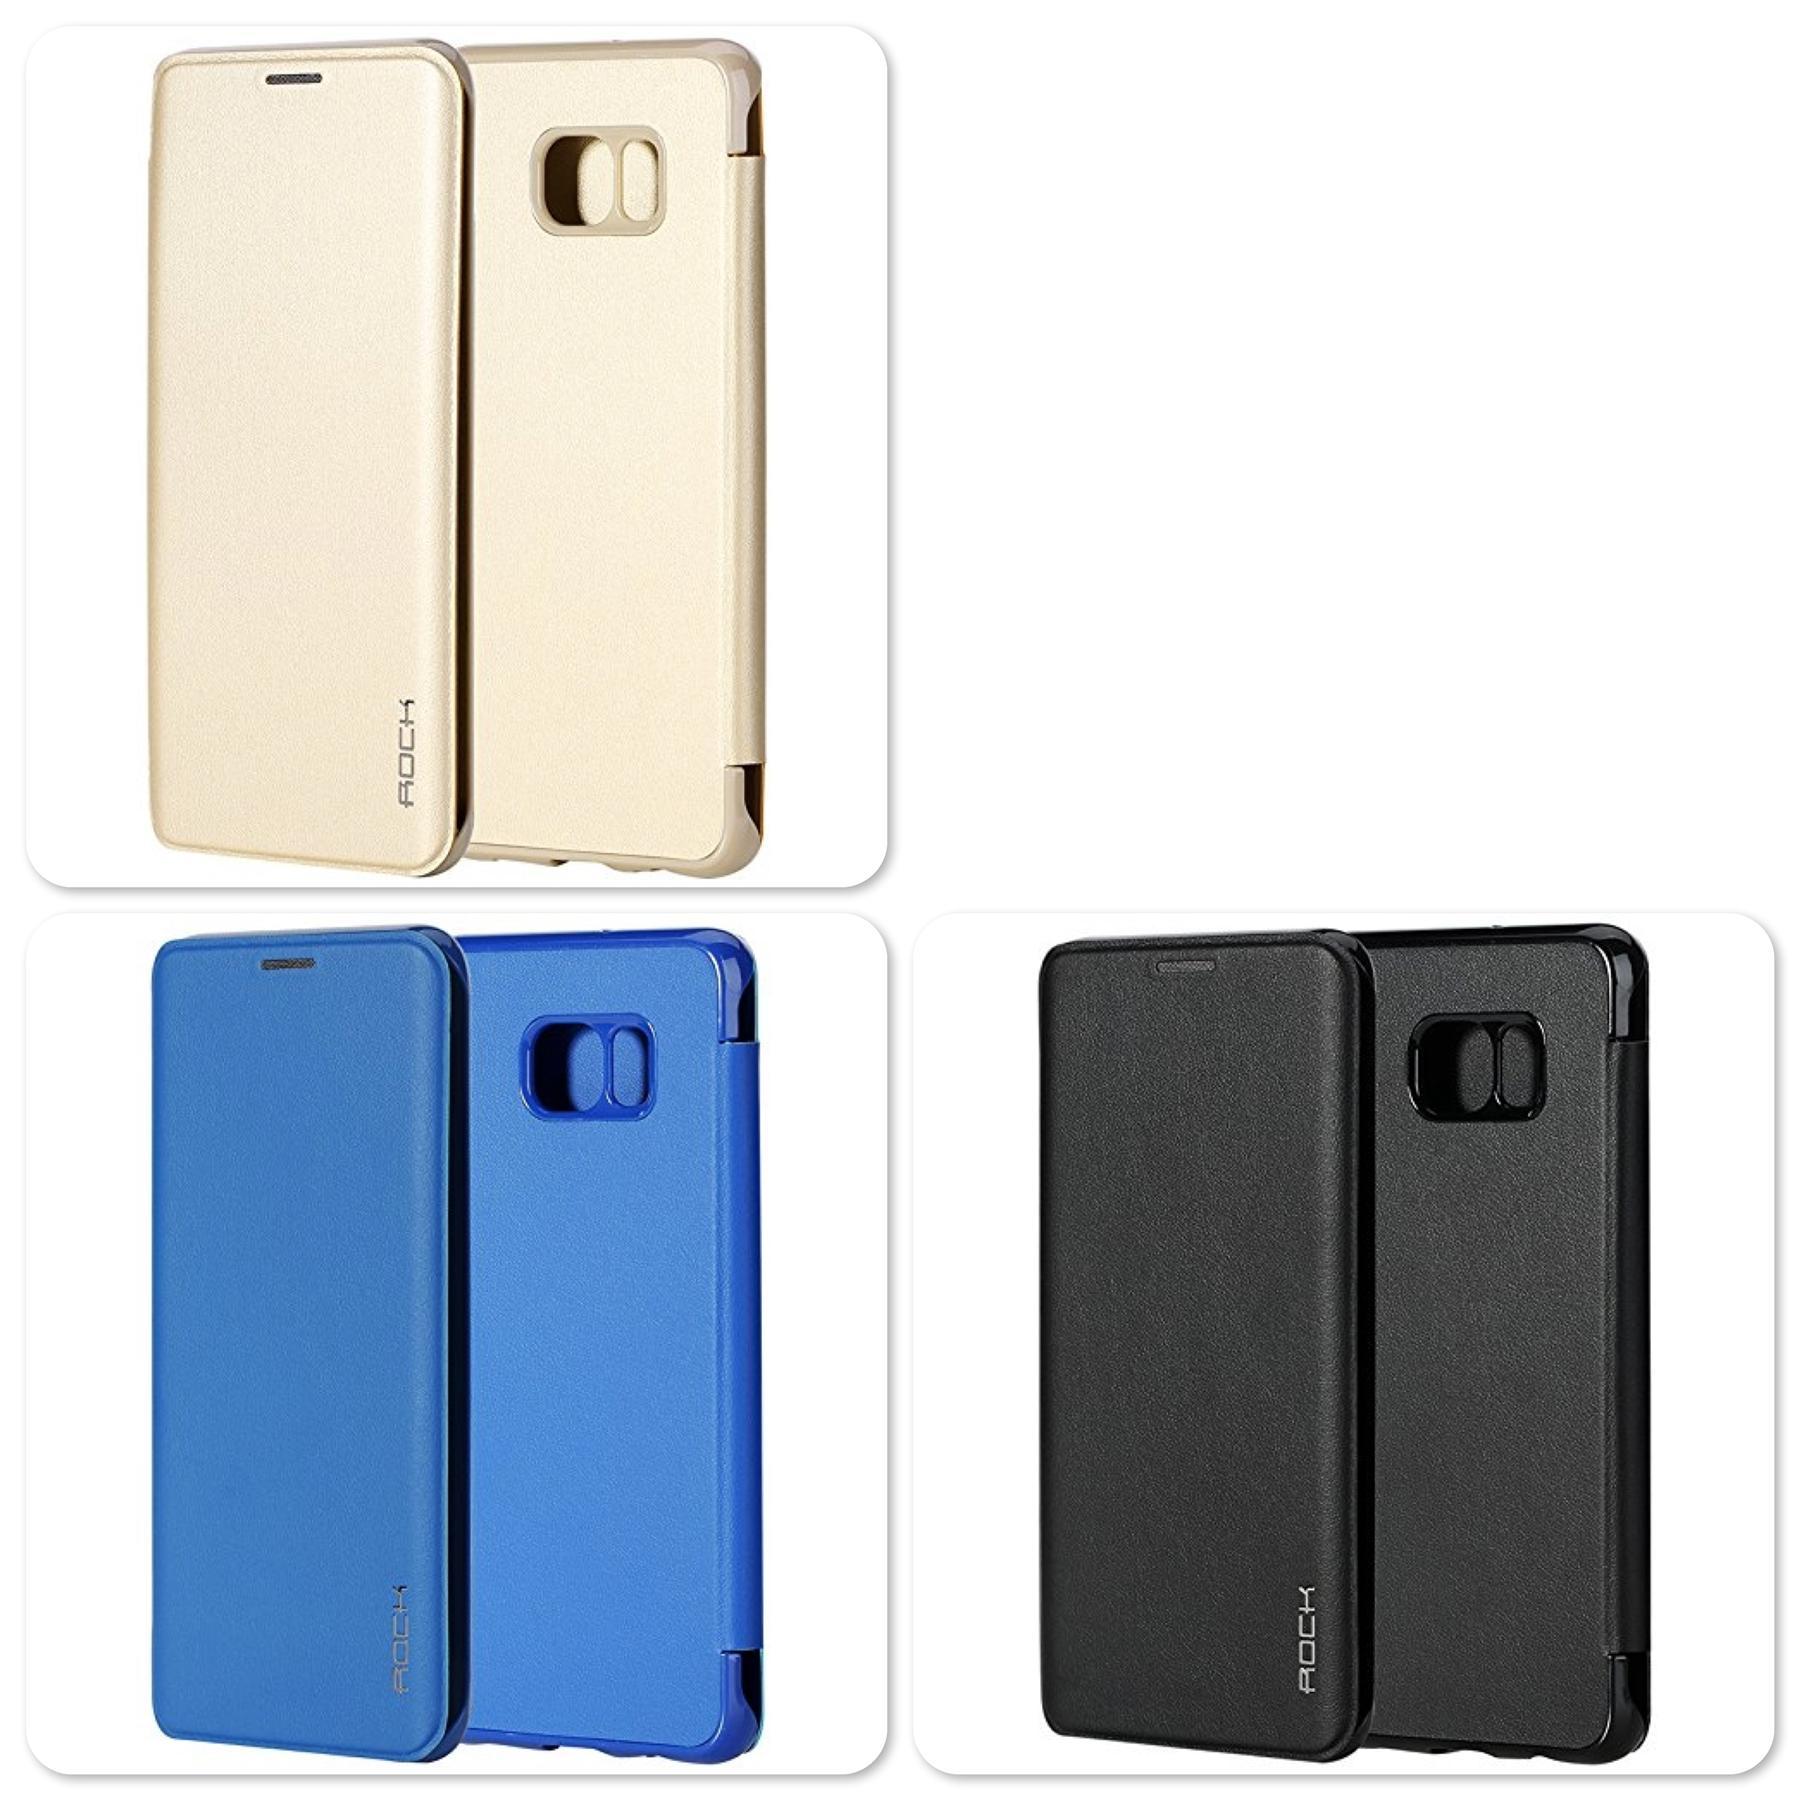 Samsung Galaxy S6 Edge Plus / S6 E (end 10/28/2017 12:17 PM)